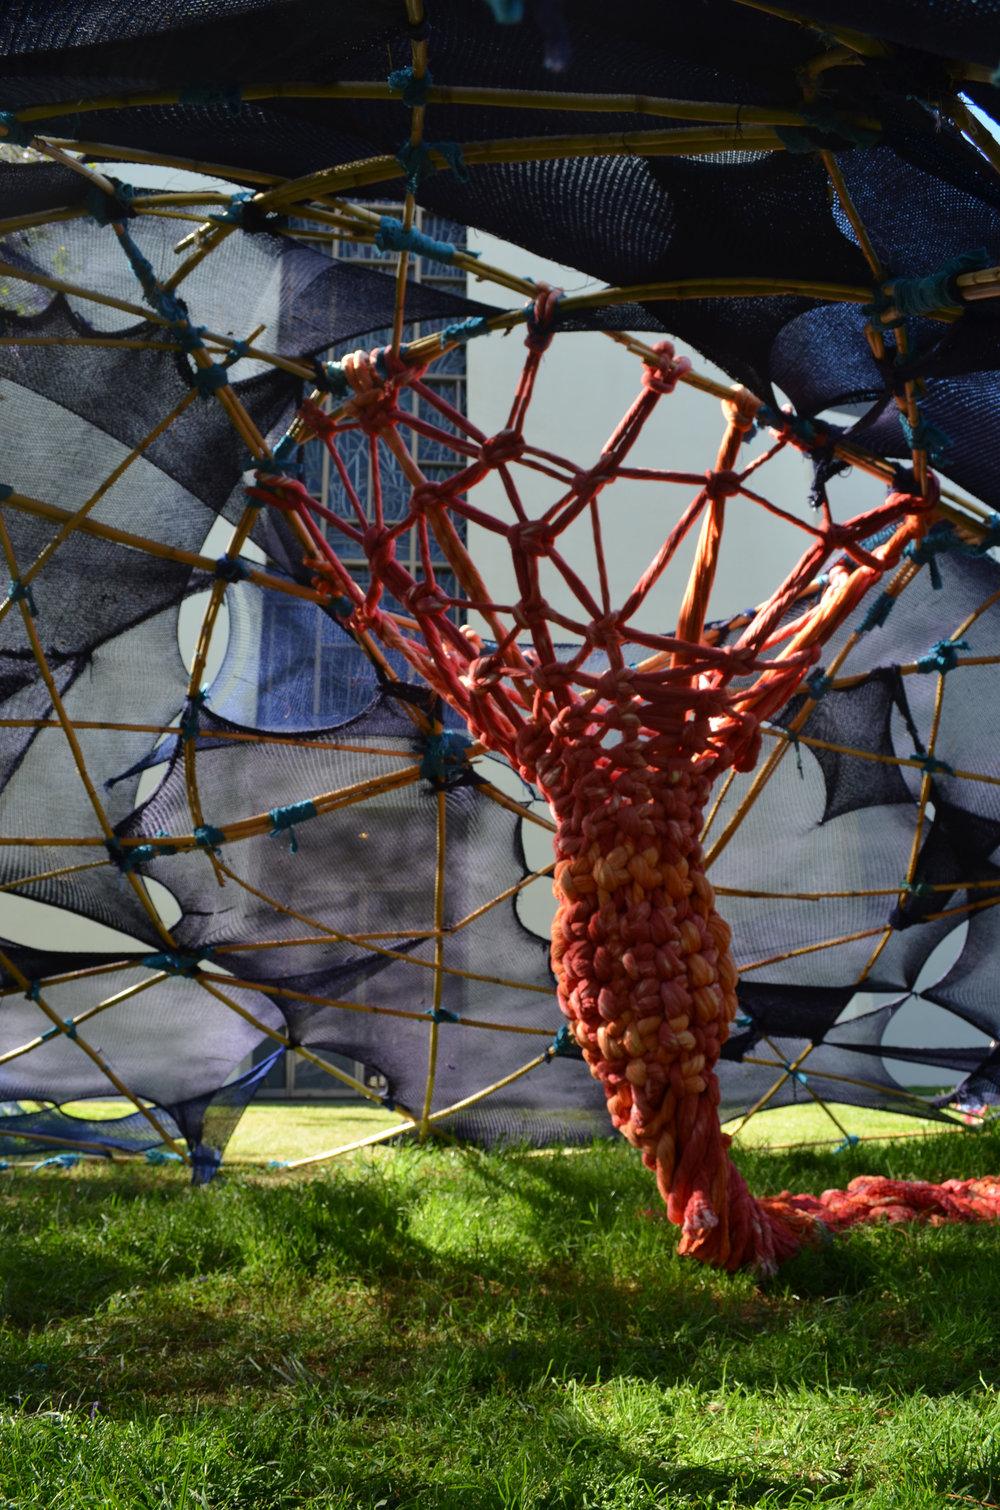 Jacqueline-Surdell-Artist-Installation-Tents-03.jpg